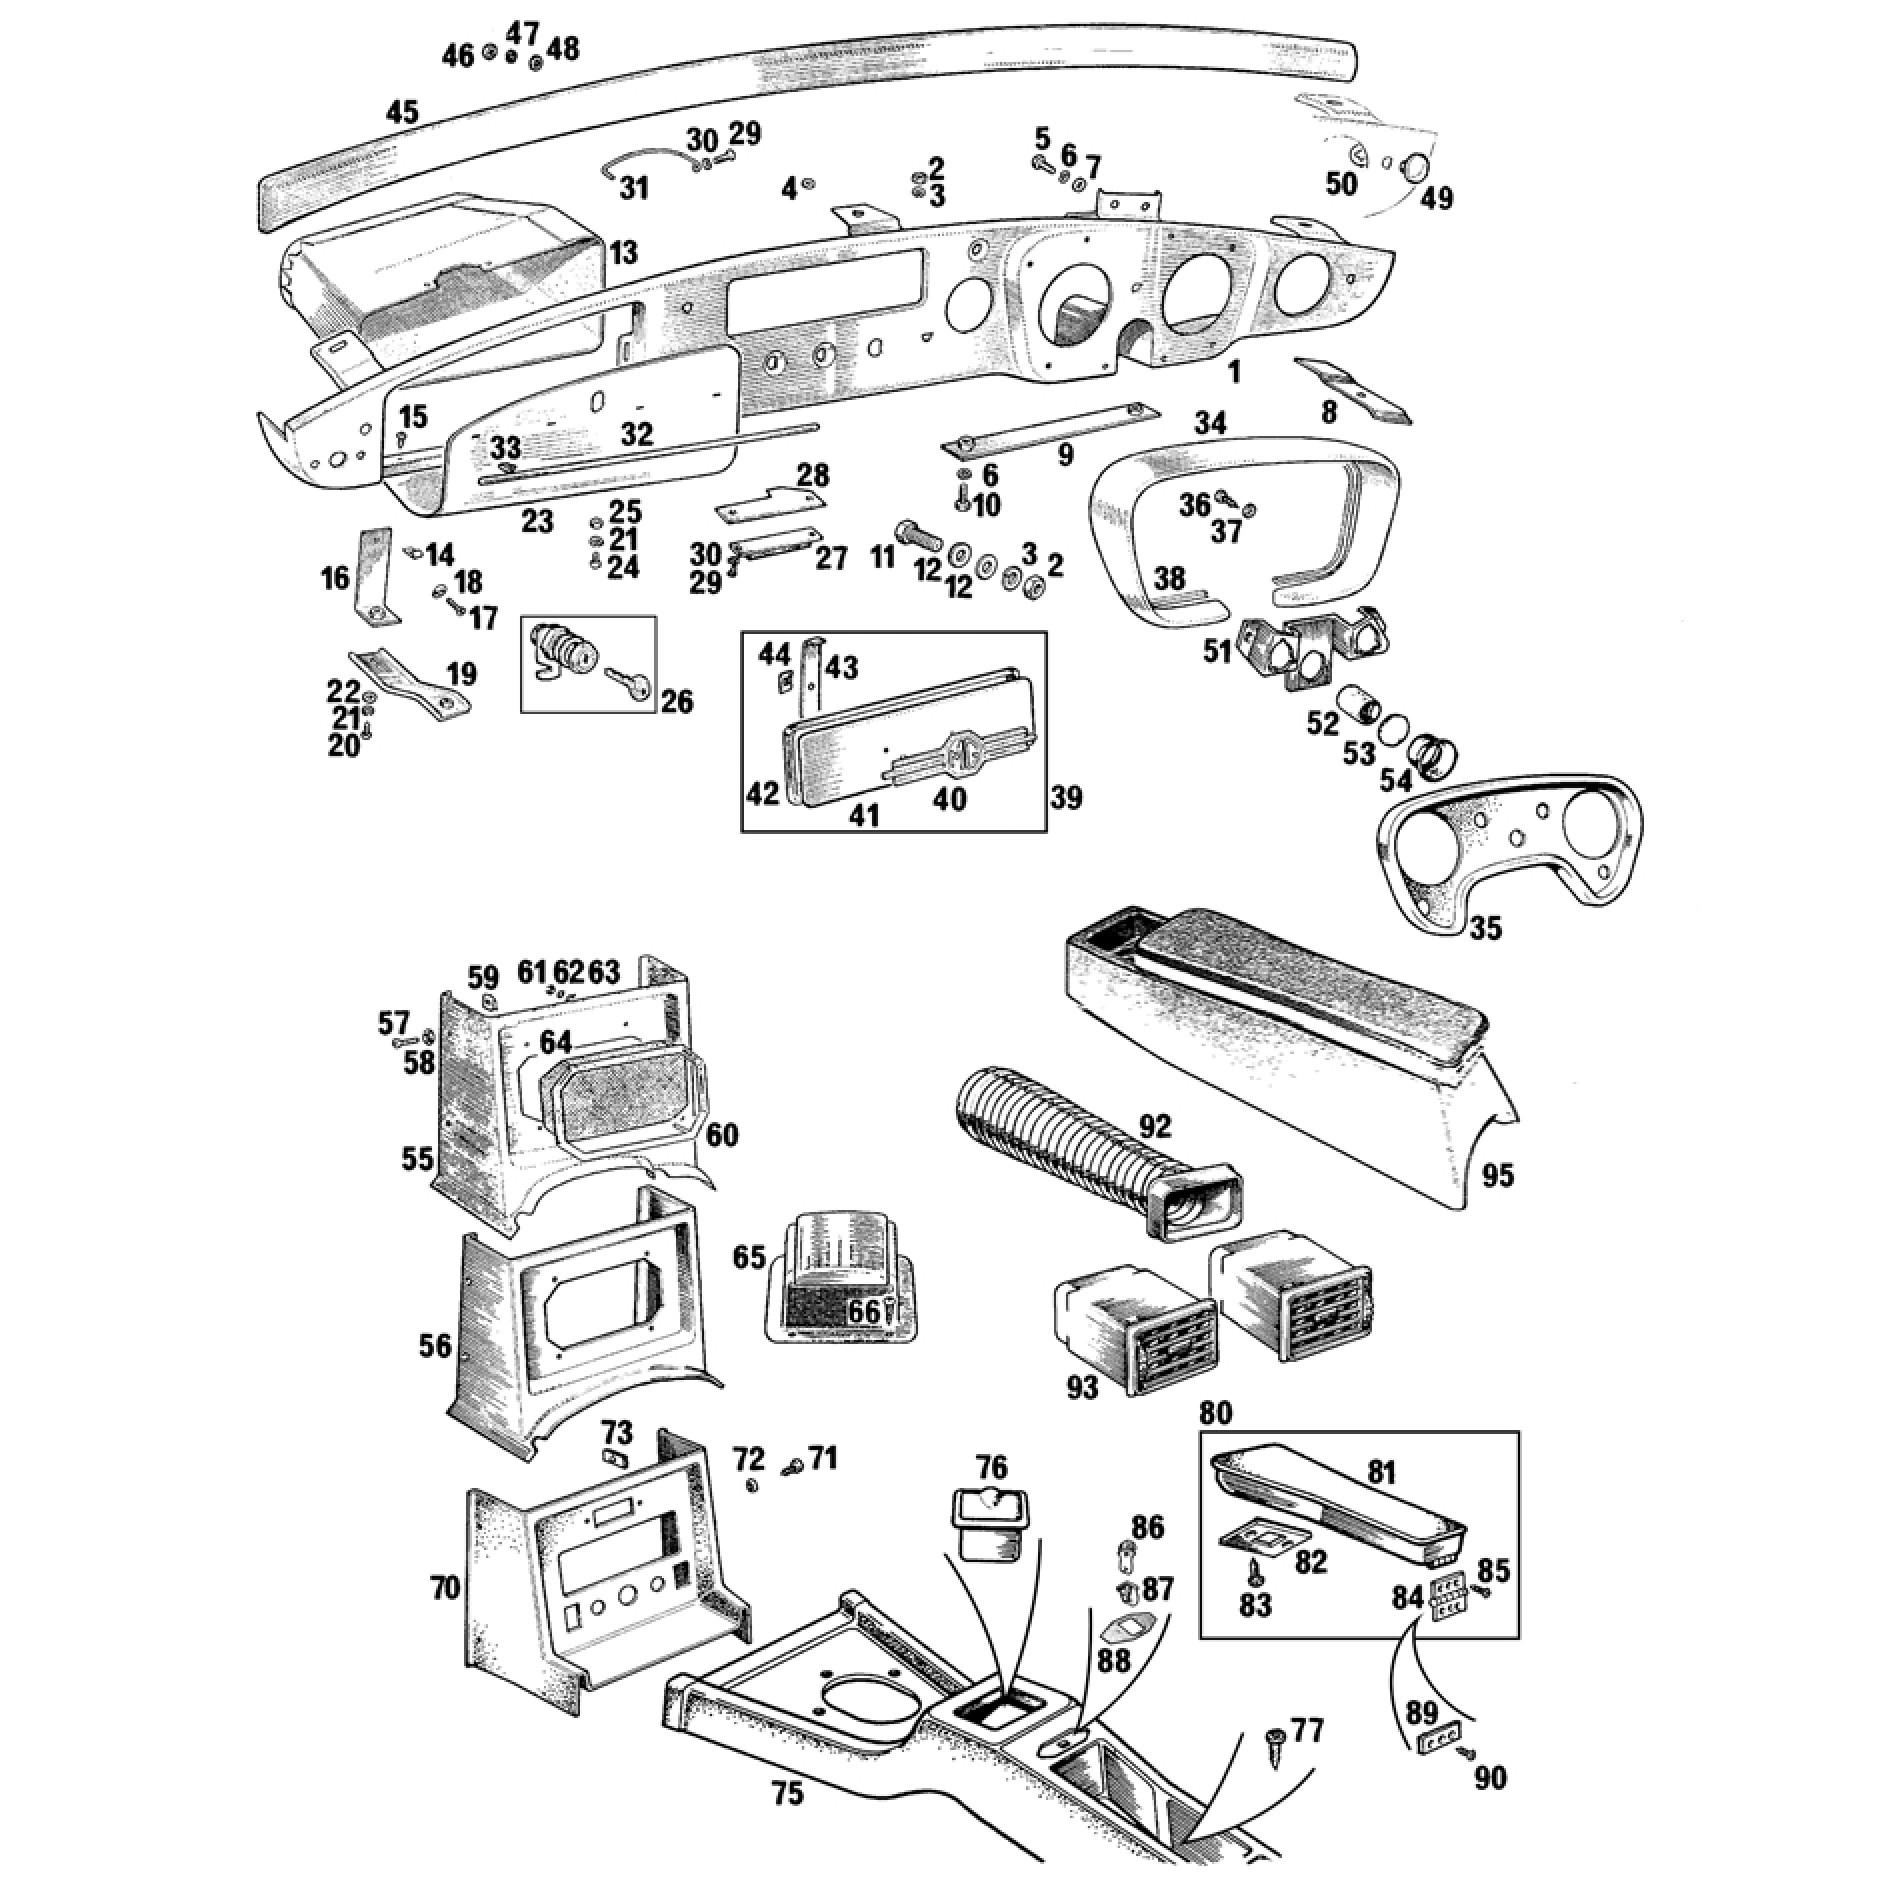 76 Triumph Tr6 Wiring Diagram